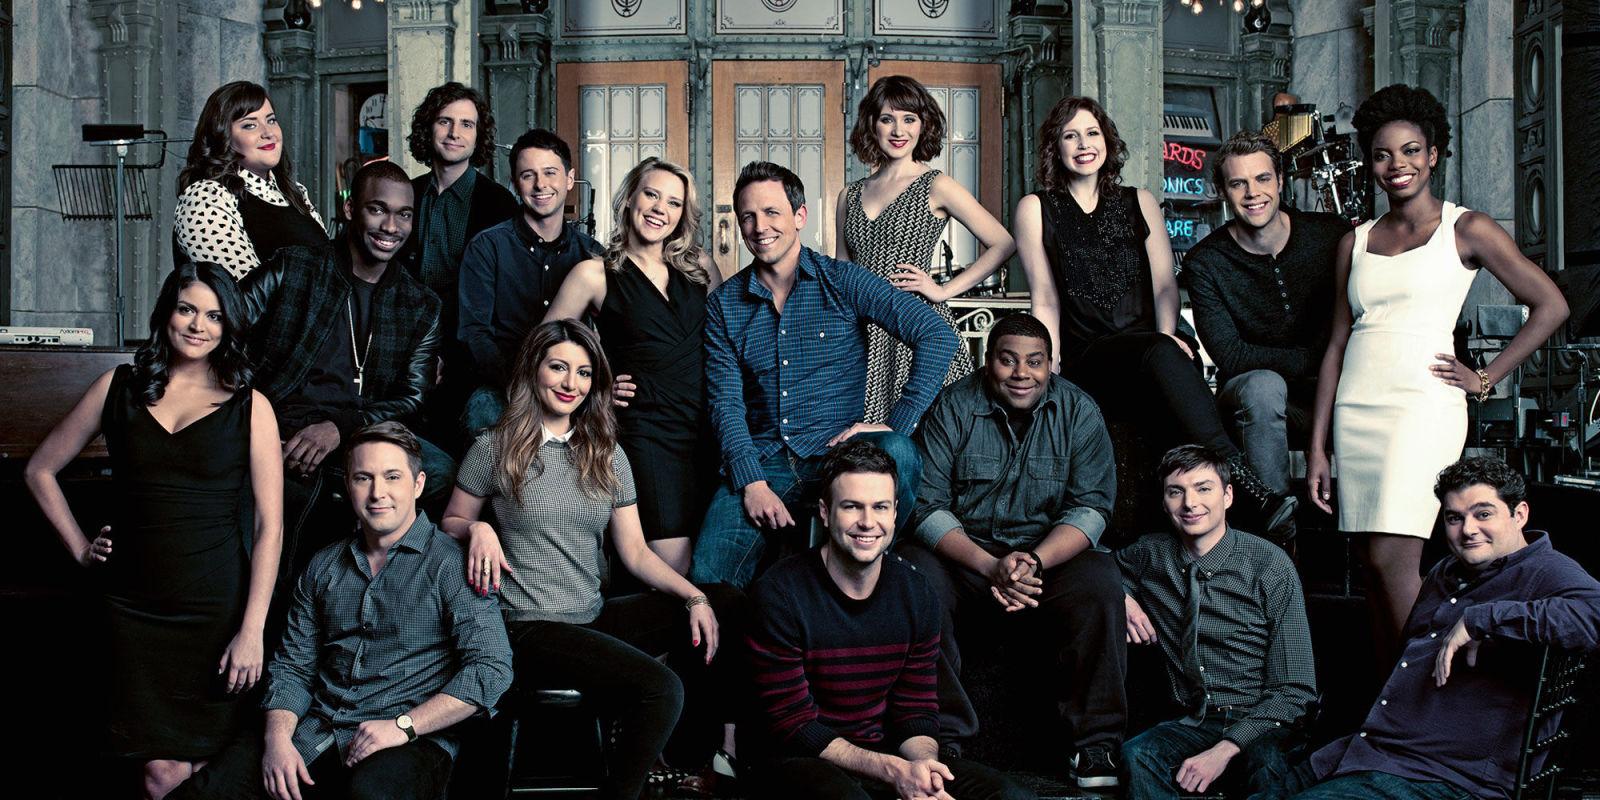 Bobby Moynihan is leaving Saturday Night Live